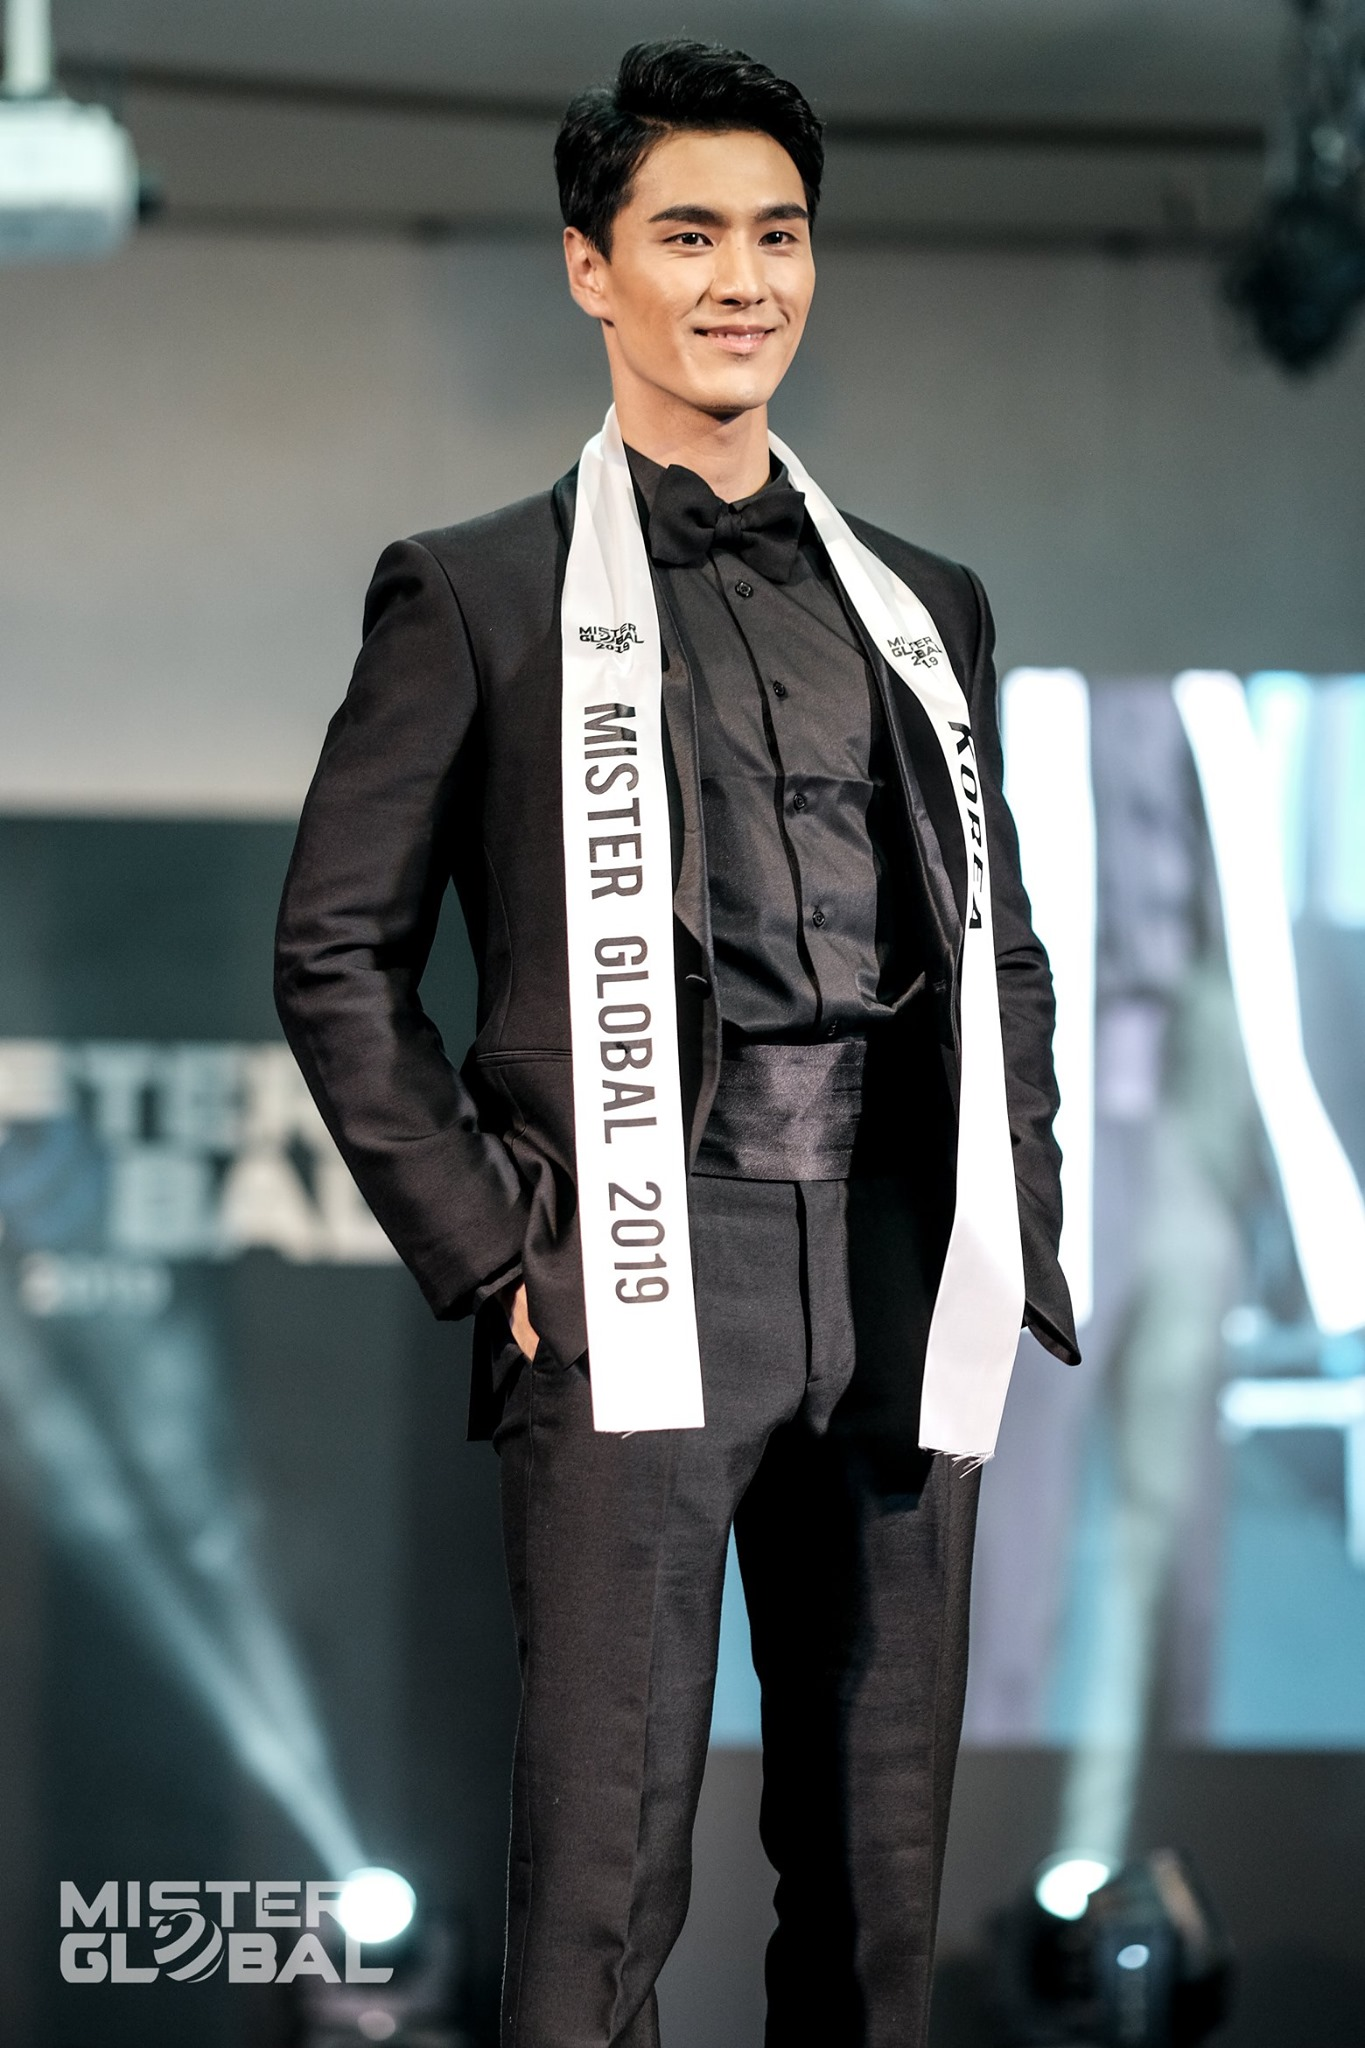 jongwoo kim, mr global 2019. - Página 3 71771810